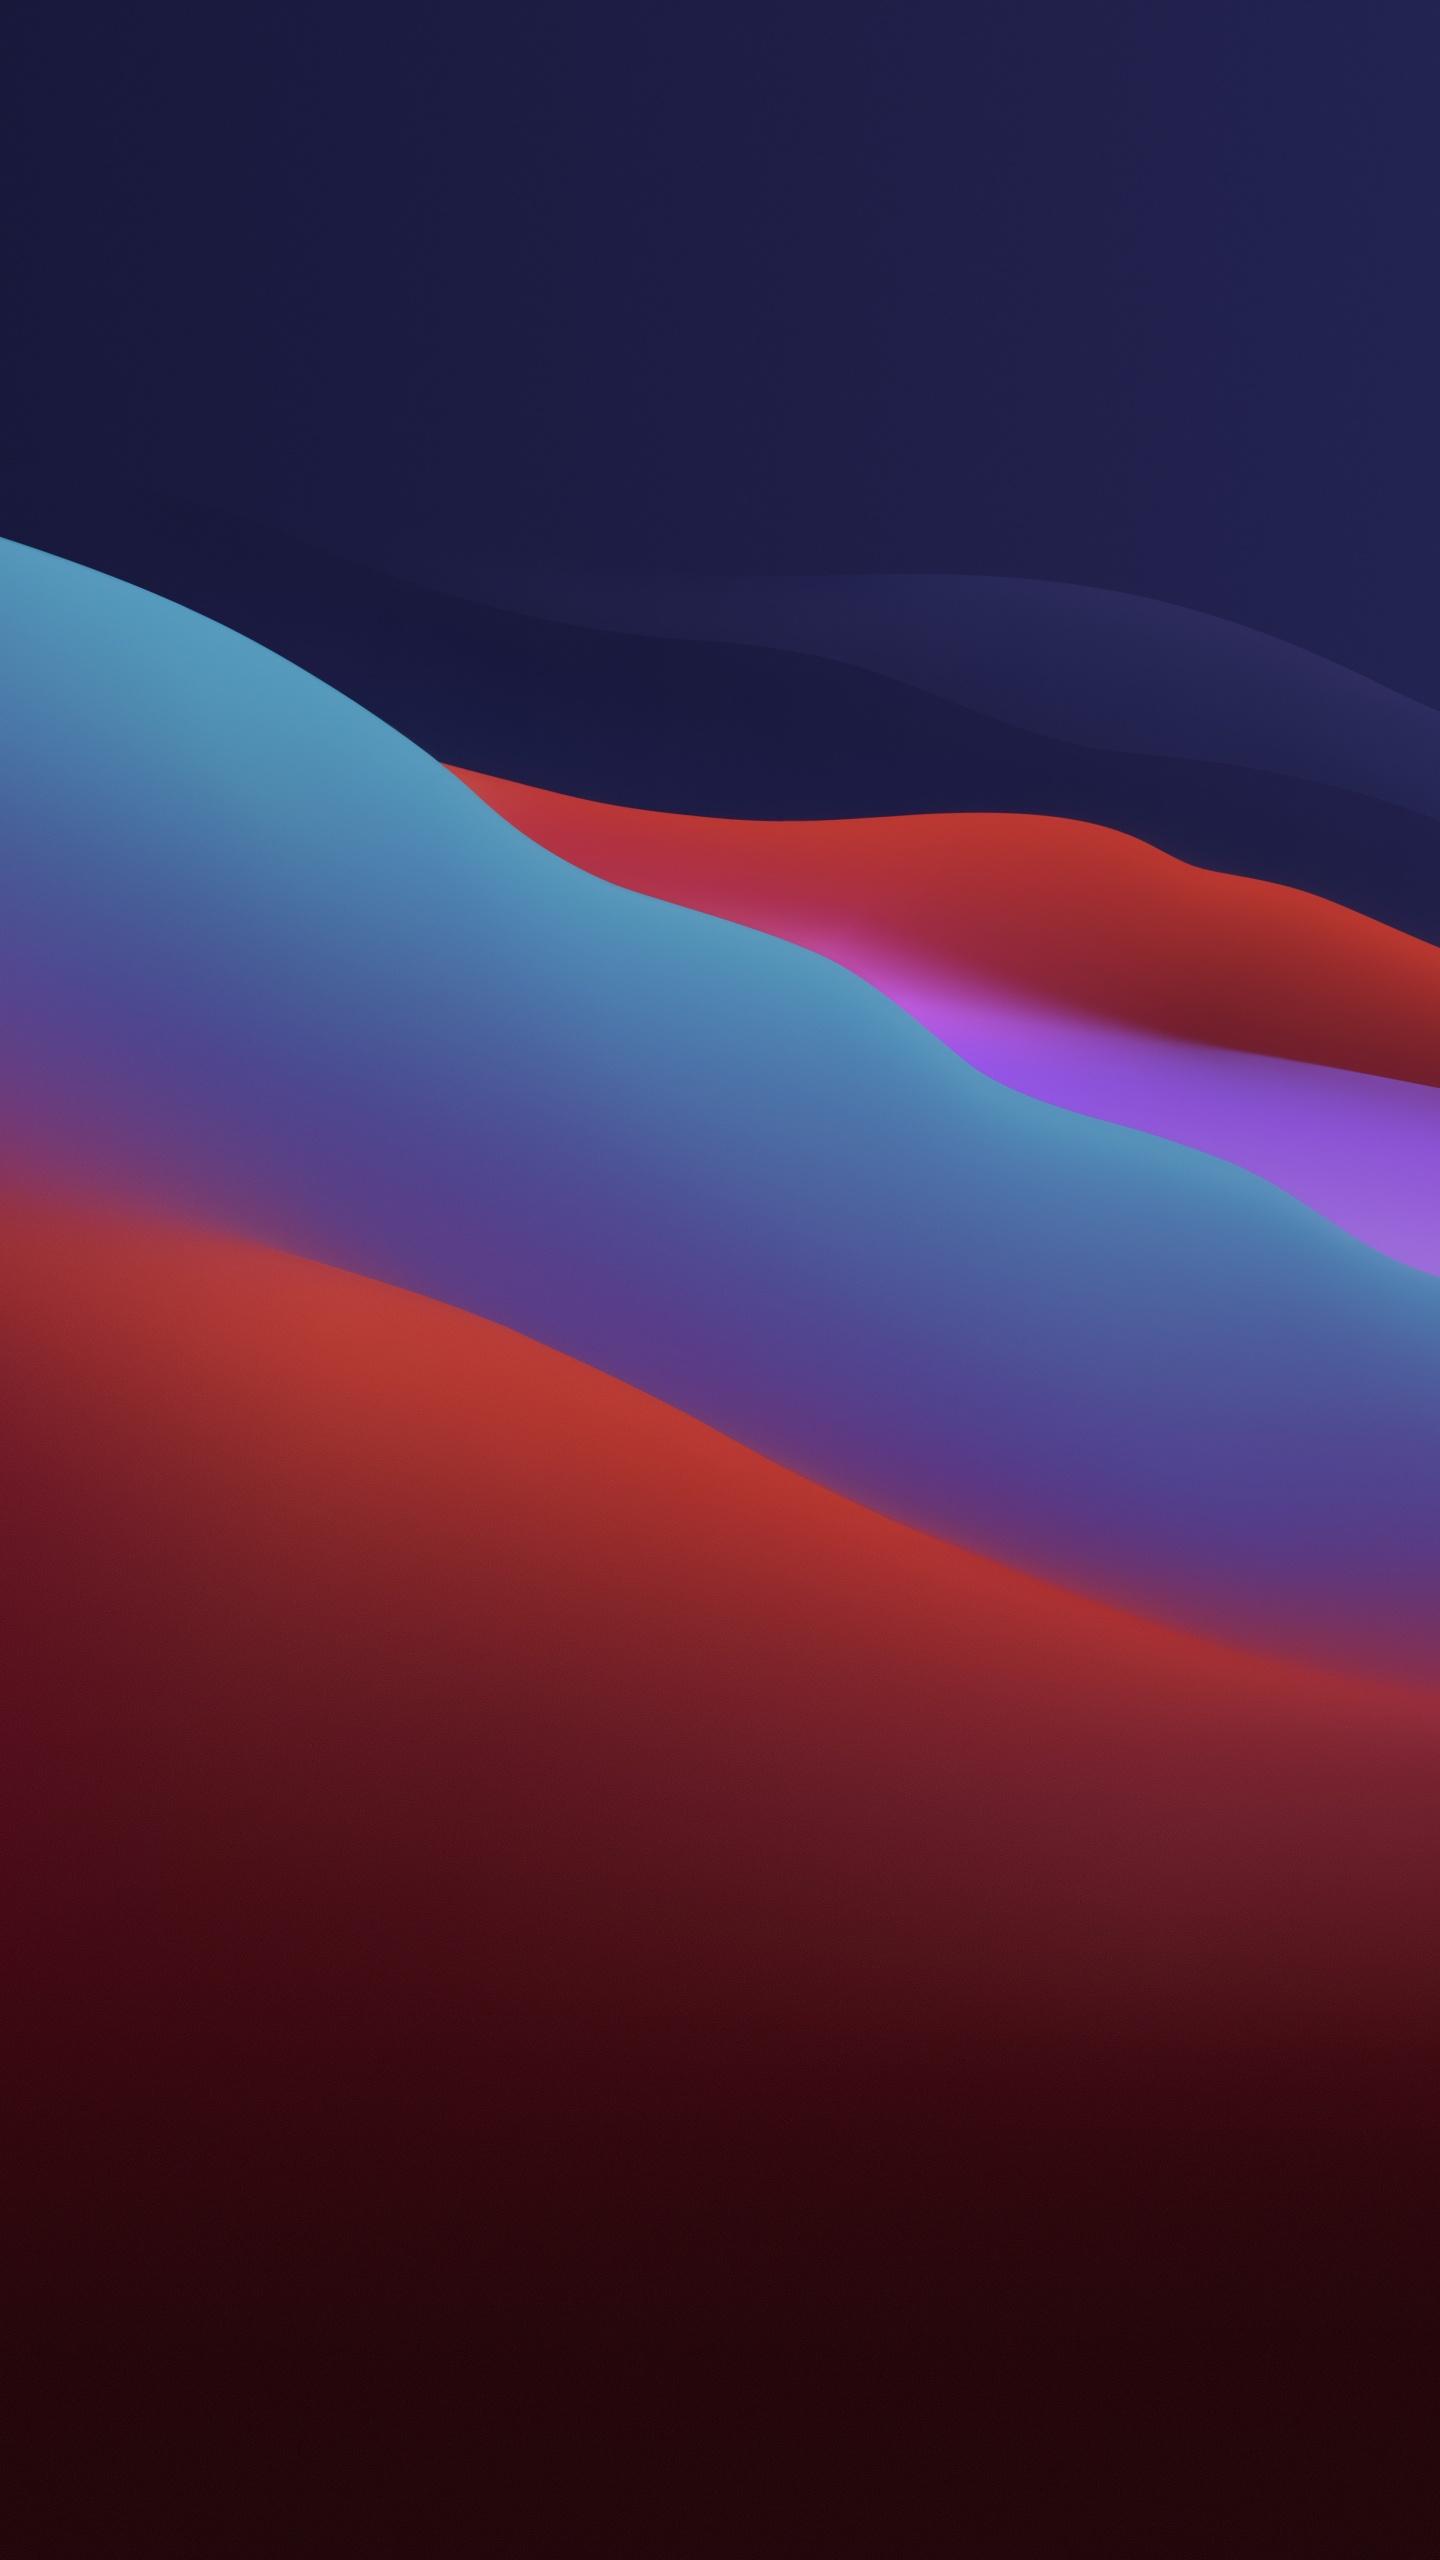 macOS Big Sur Wallpaper 21K, Apple, Layers, Fluidic, Colorful, Dark ...